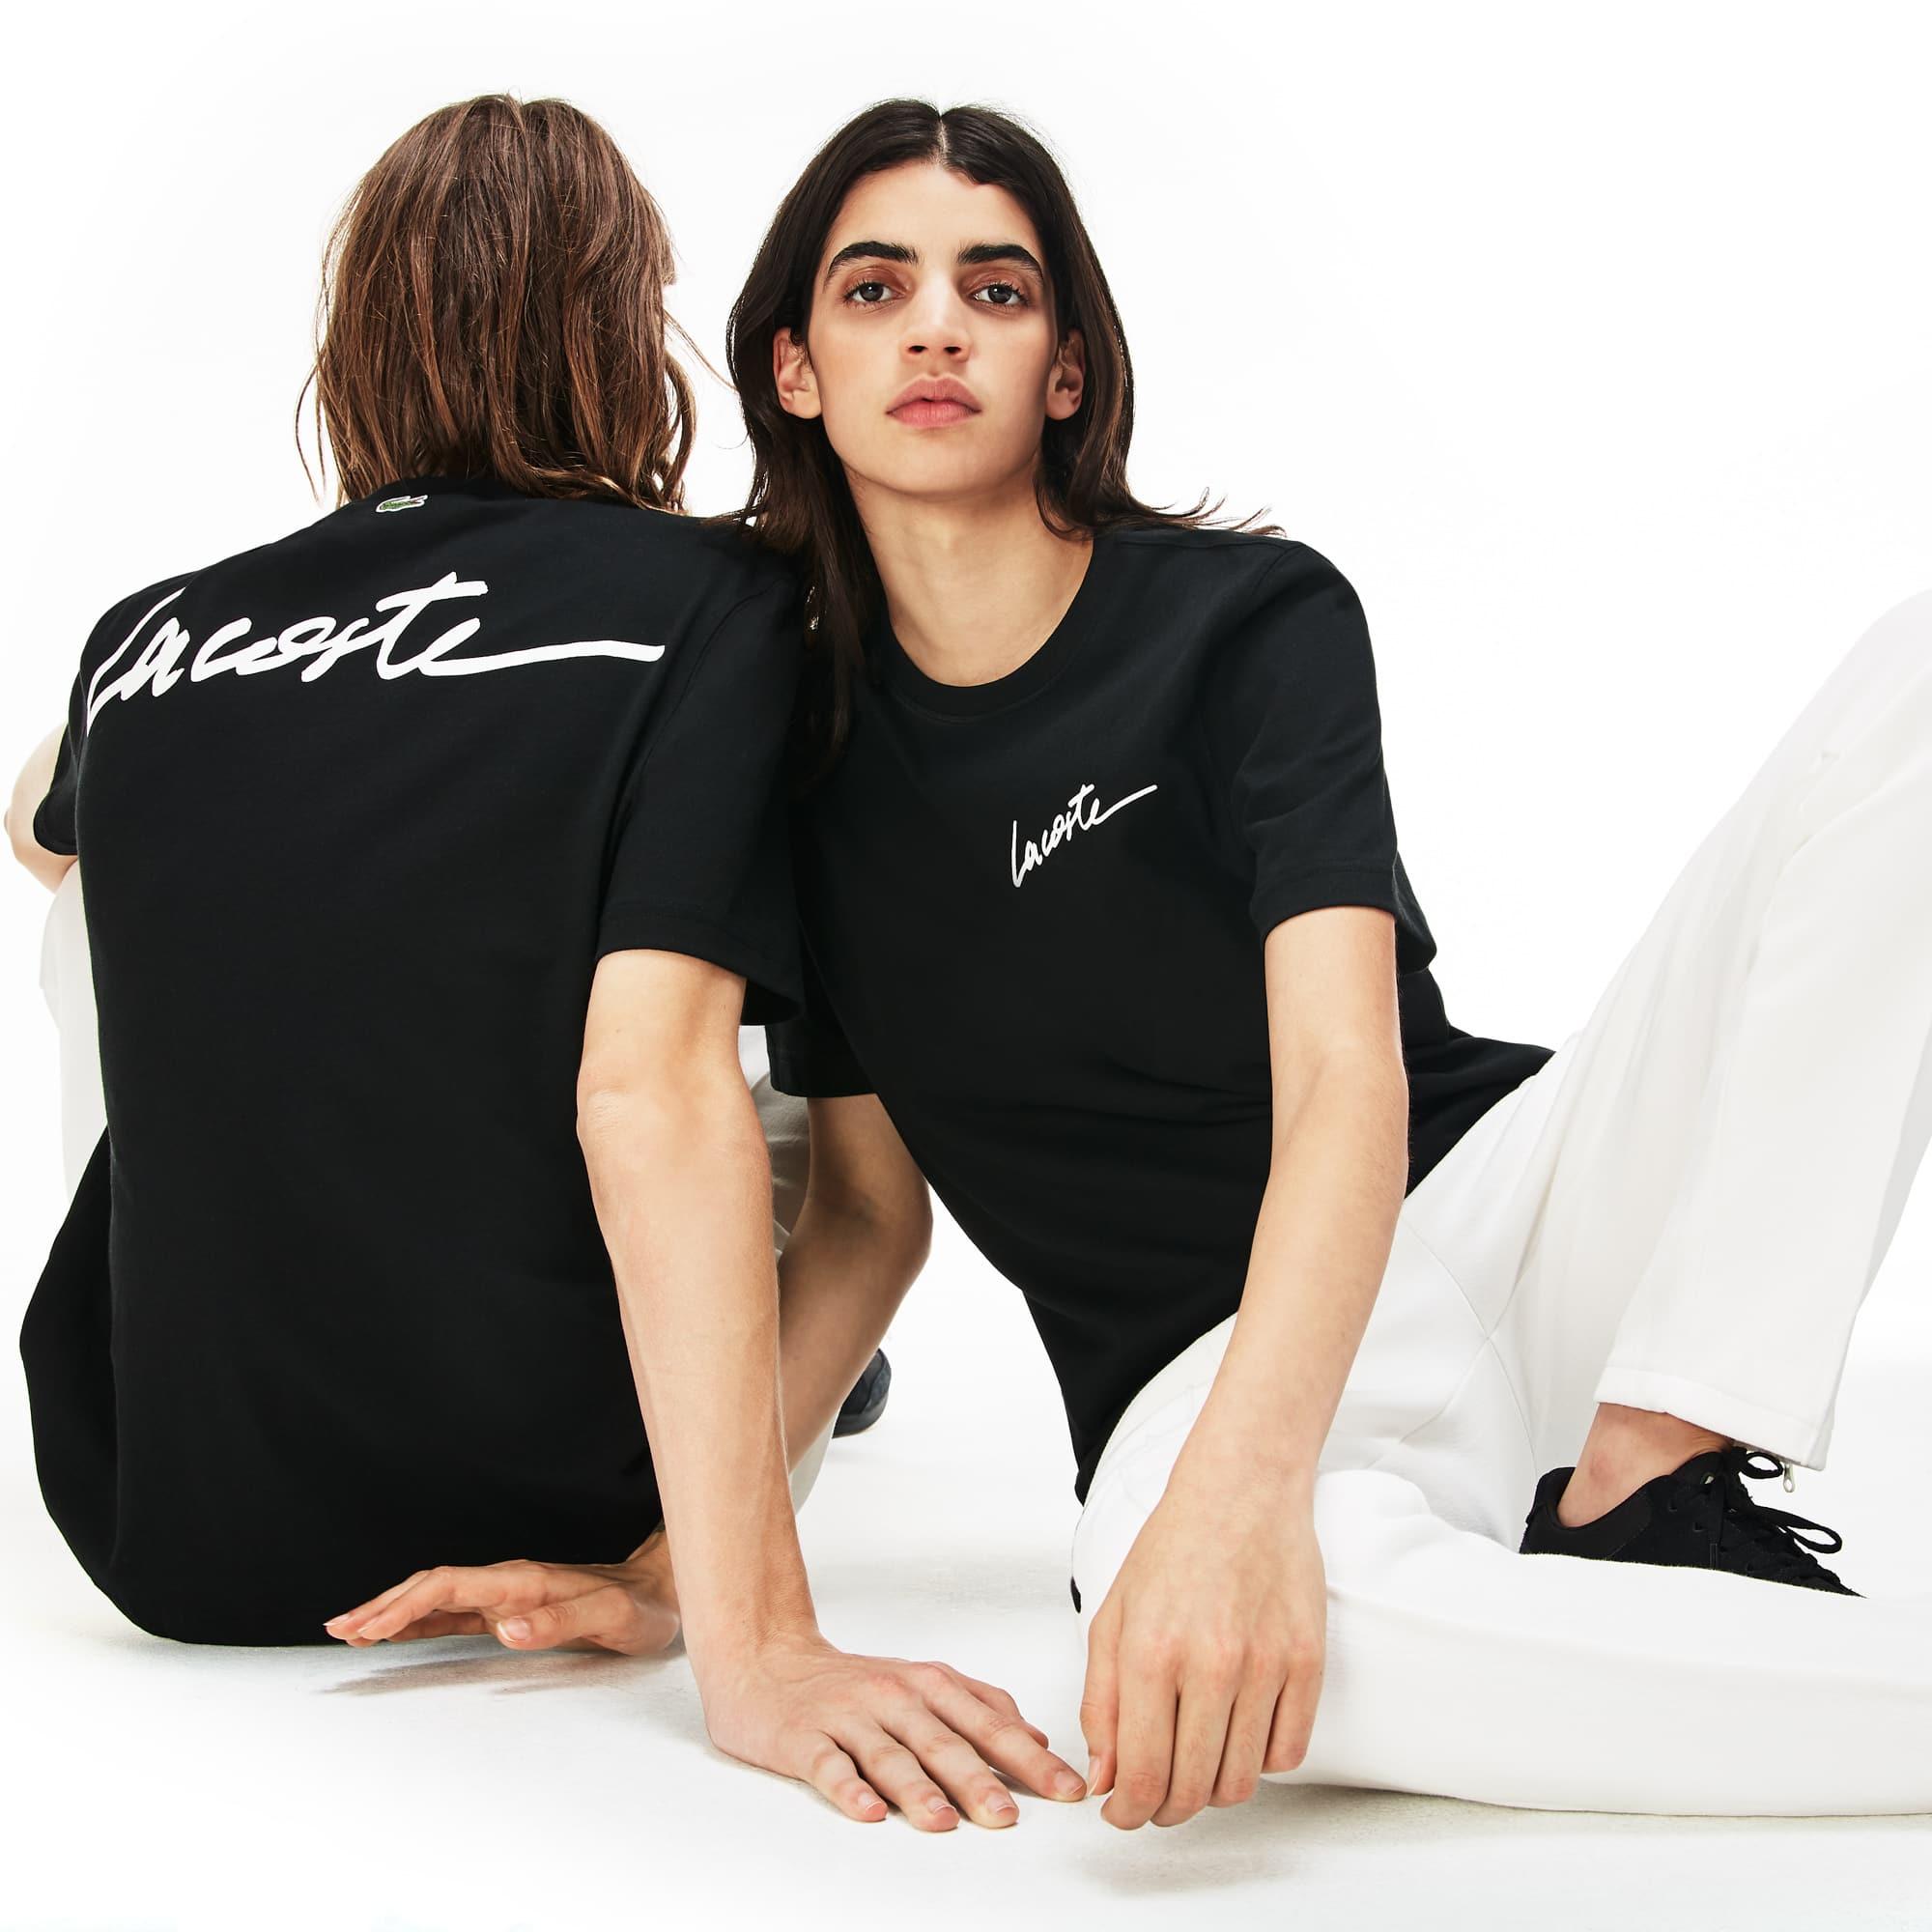 T-shirt a girocollo Lacoste LIVE in jersey con logo Lacoste